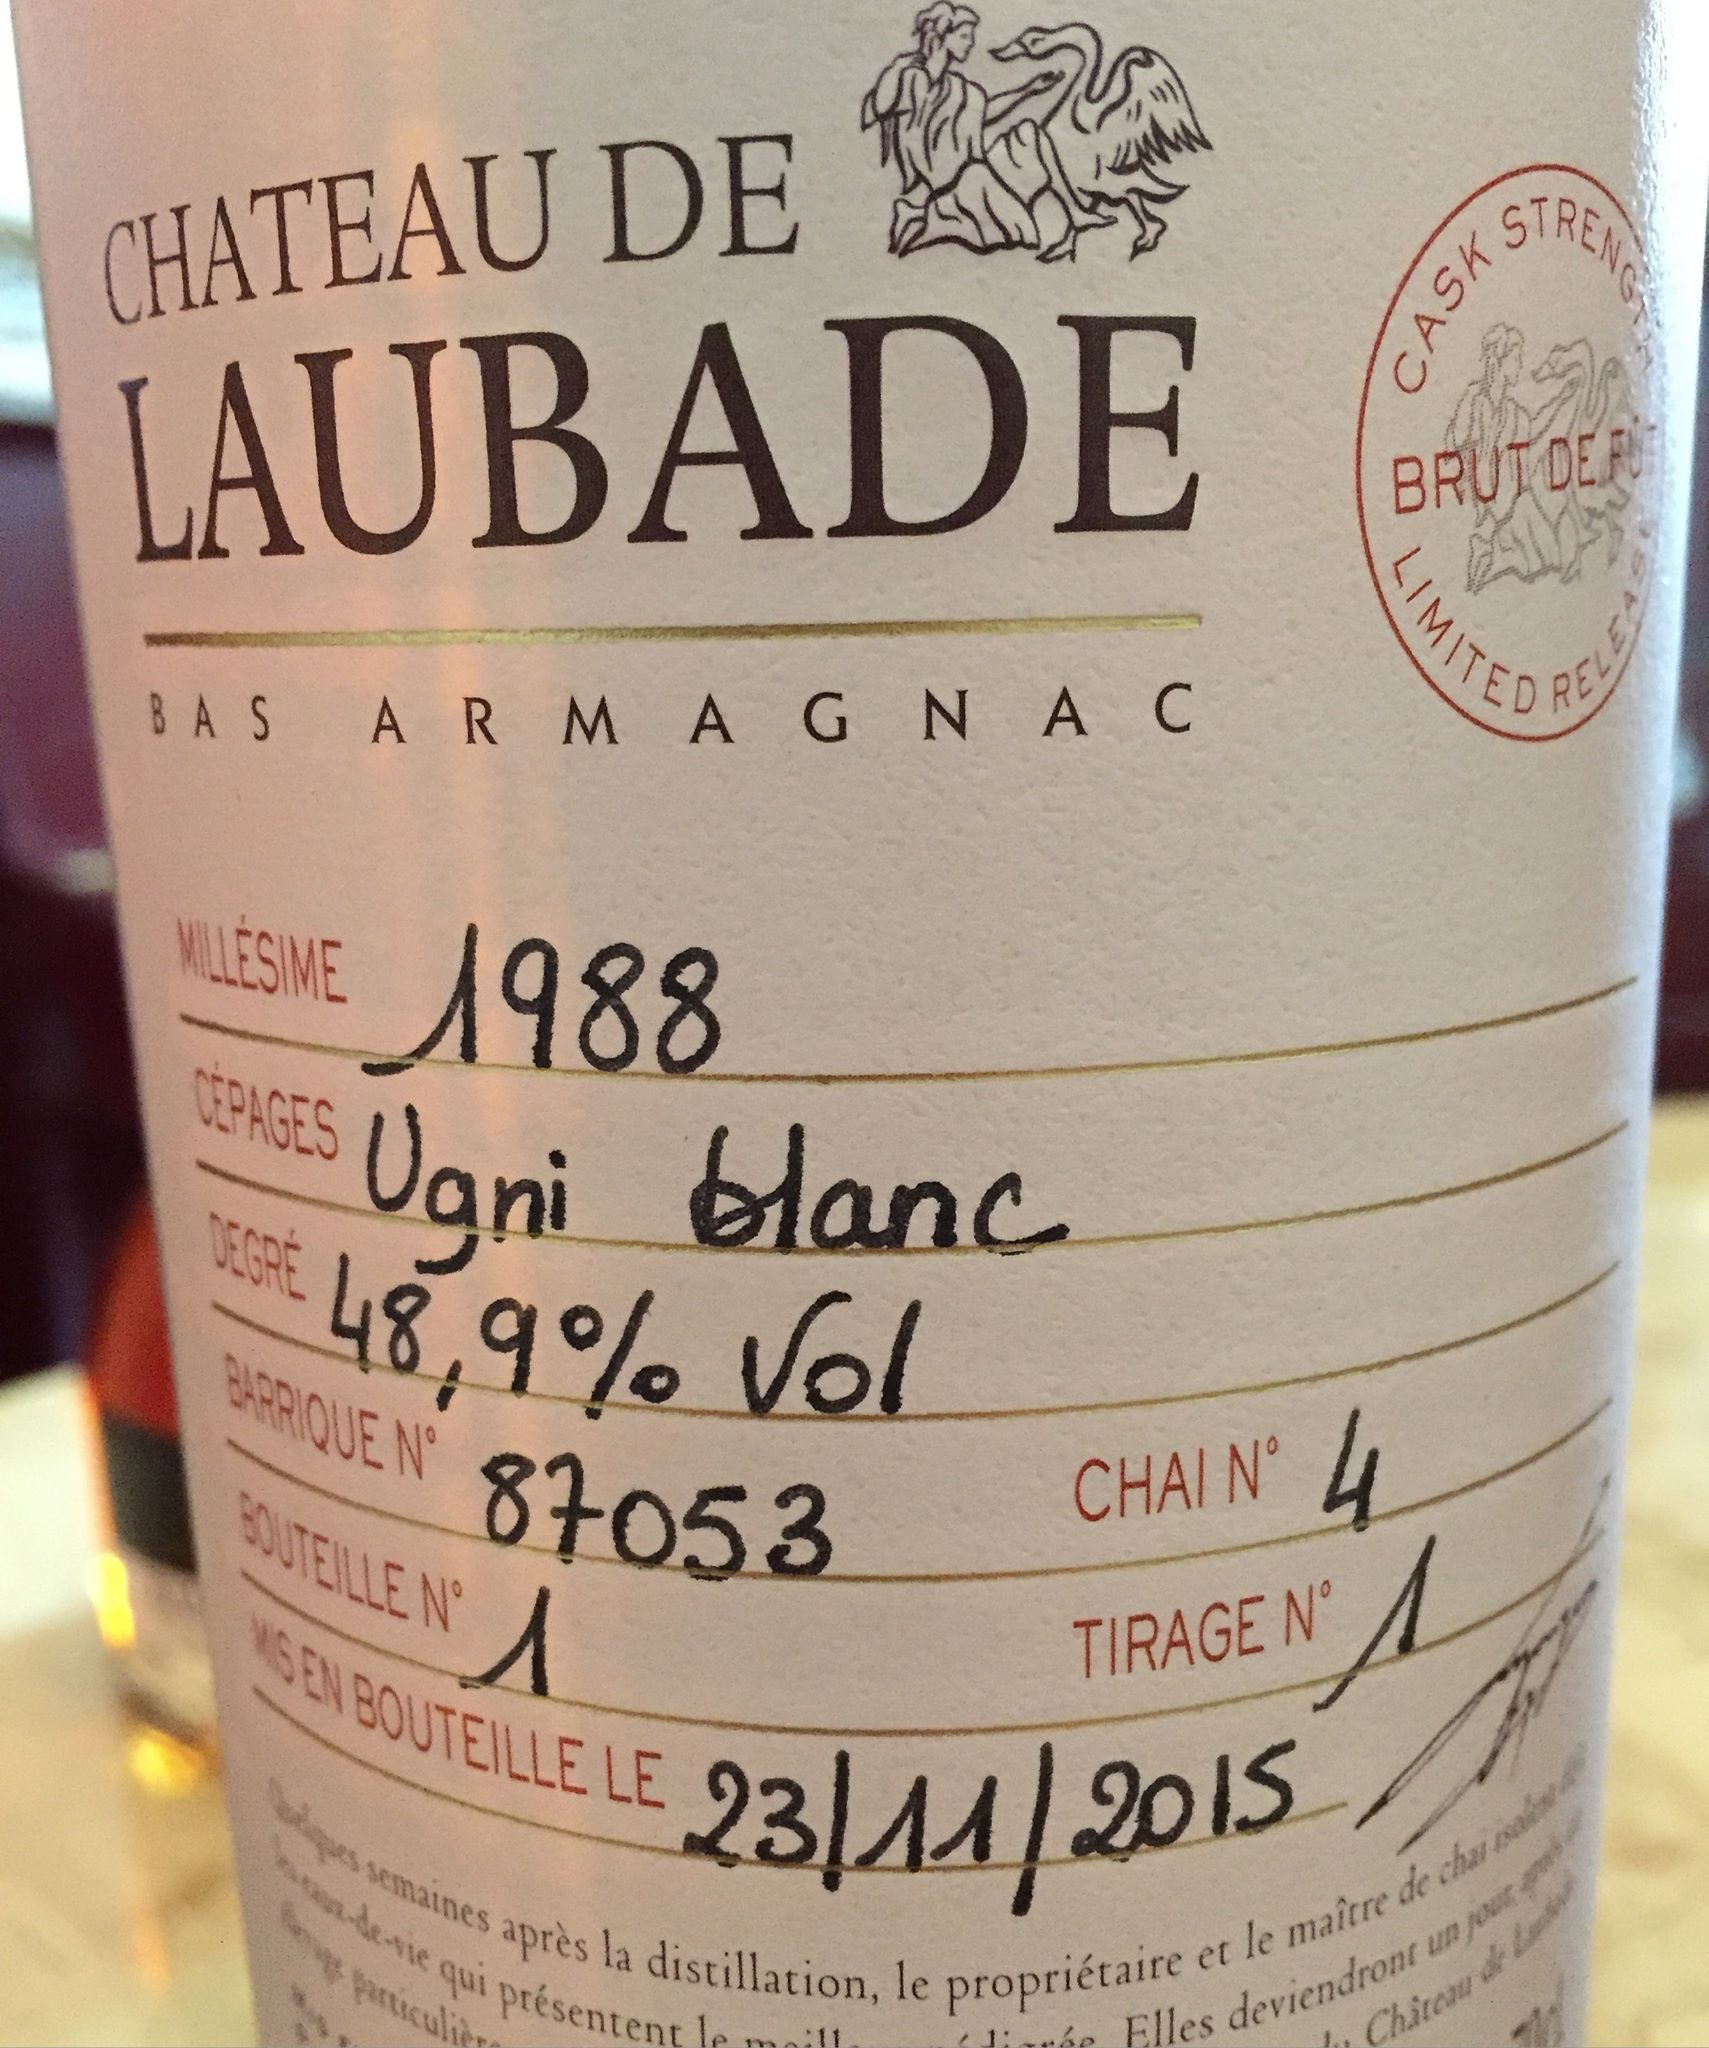 Château de Laubade 1988 – Brut de Fût / Cask Strength – Bas-Armagnac